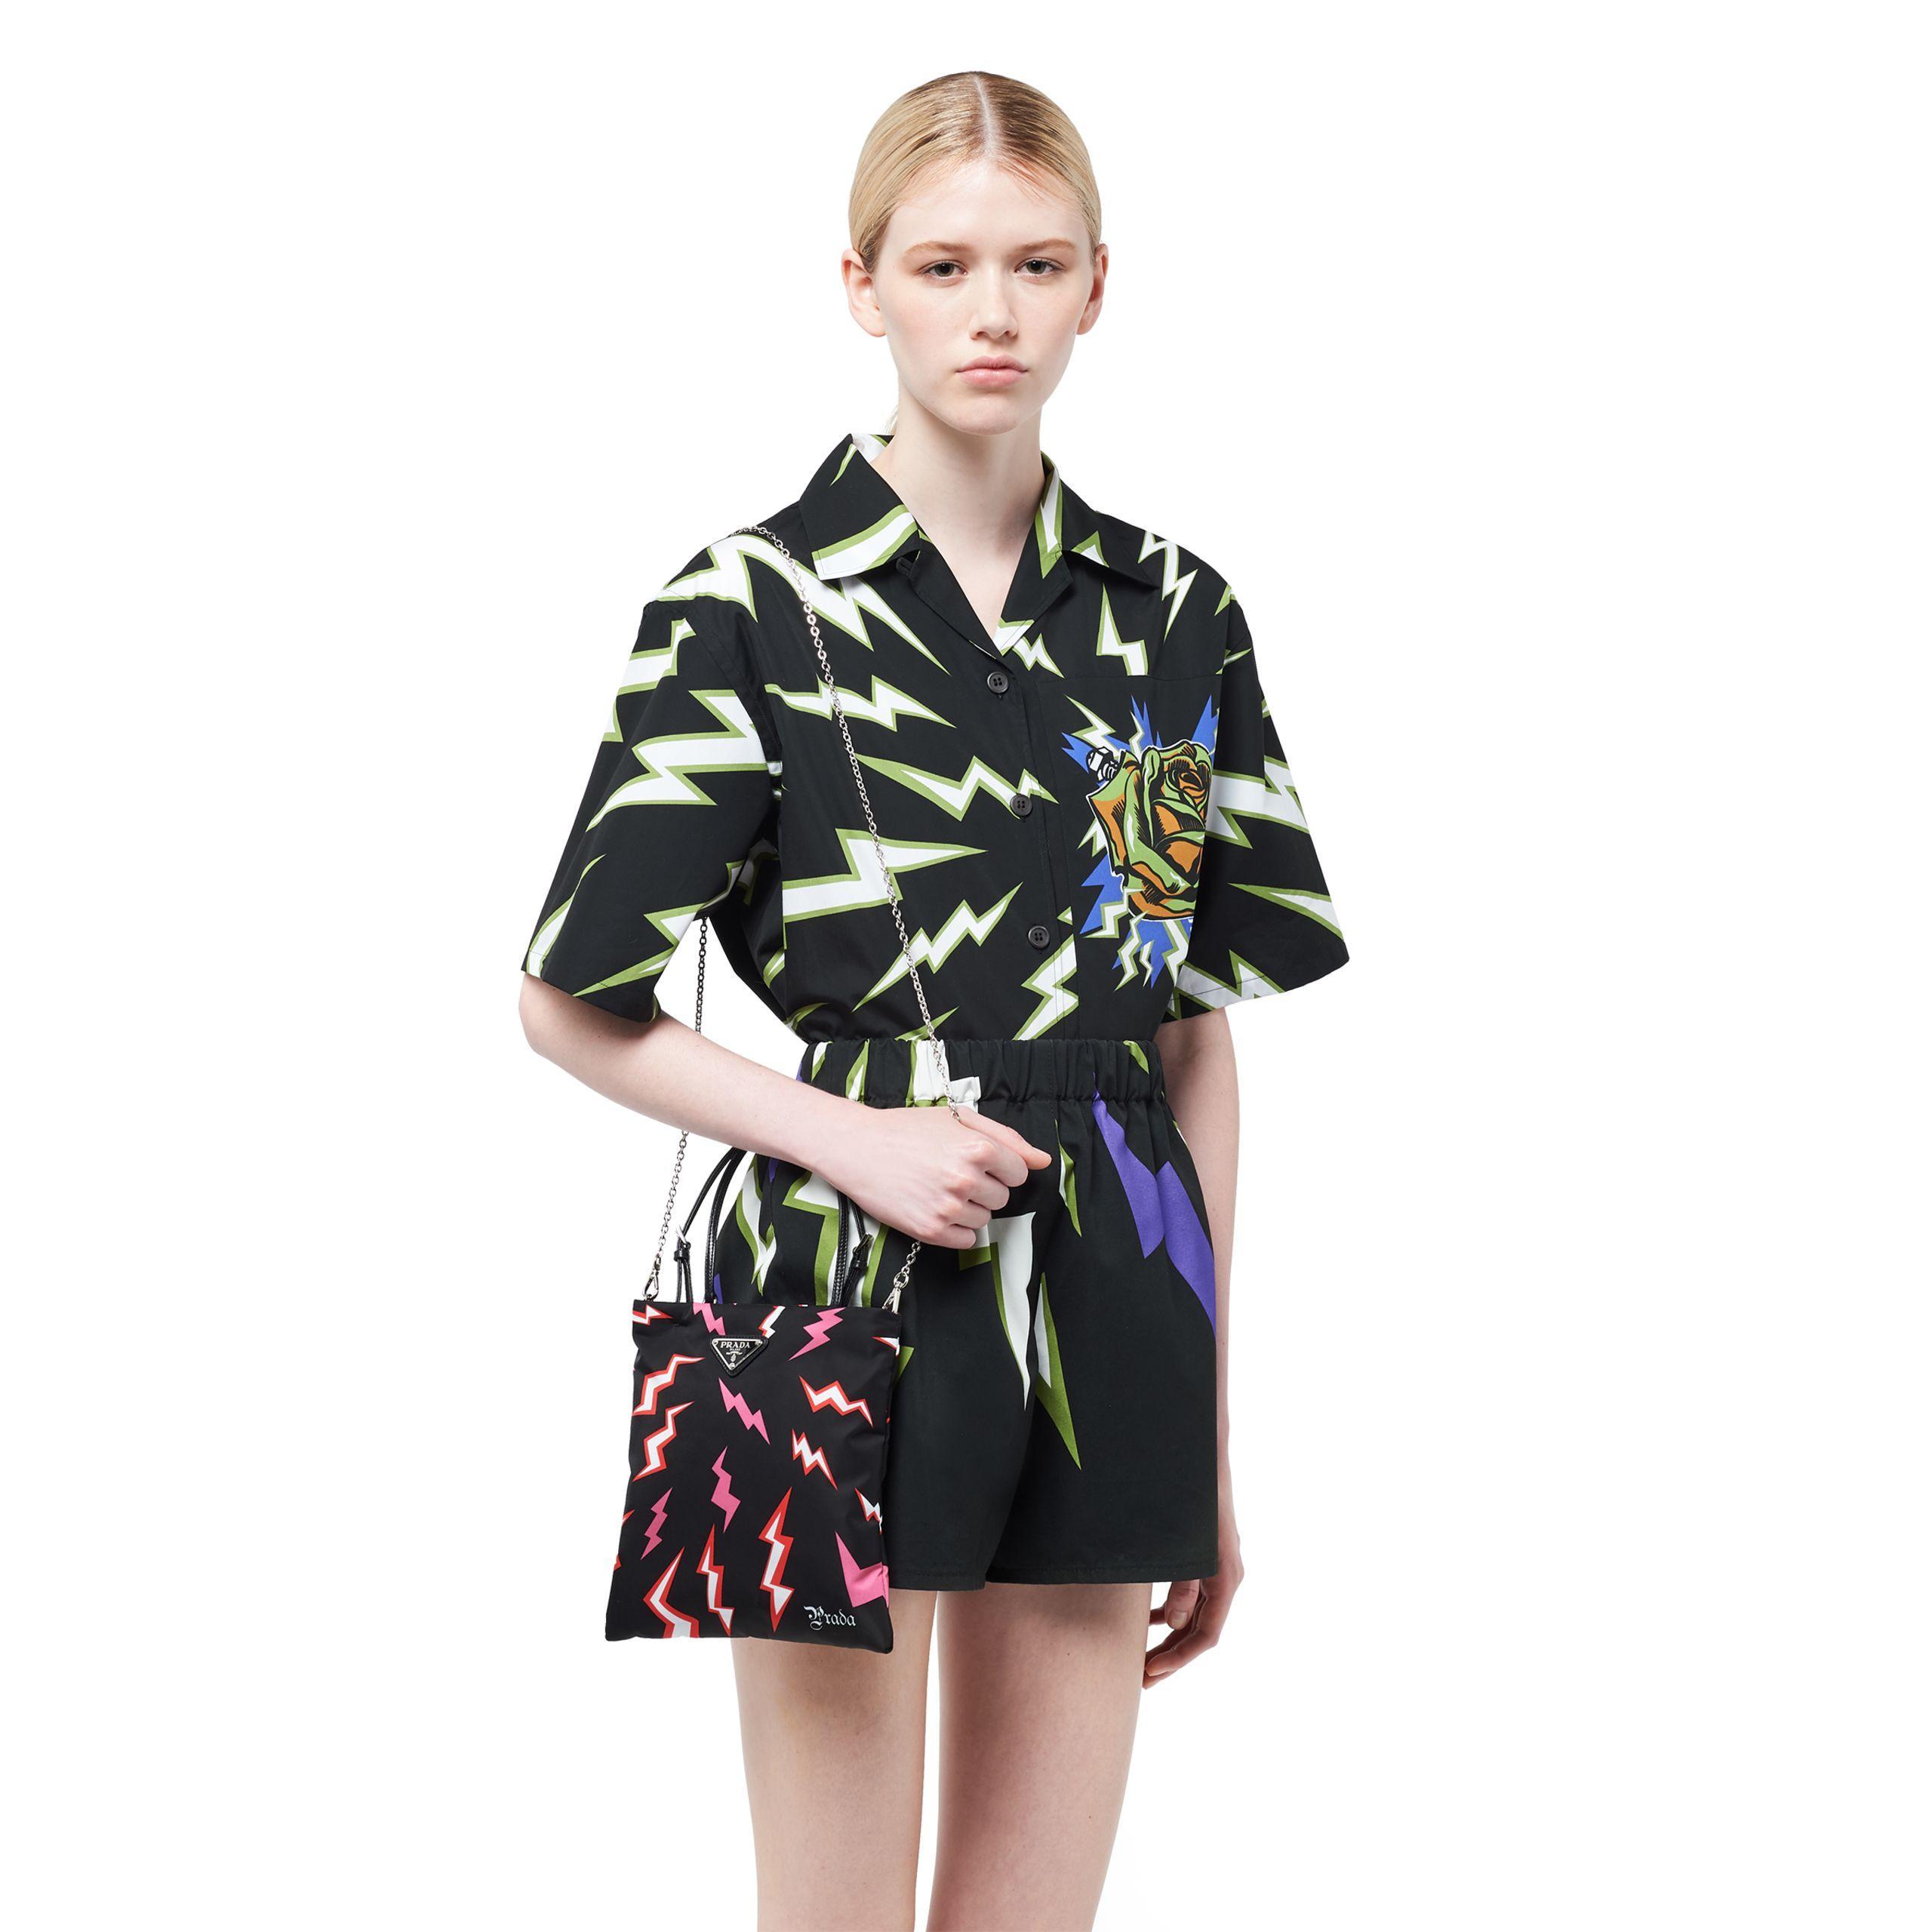 8960244bf0 Women's Black Lightning Print Nylon Handbag